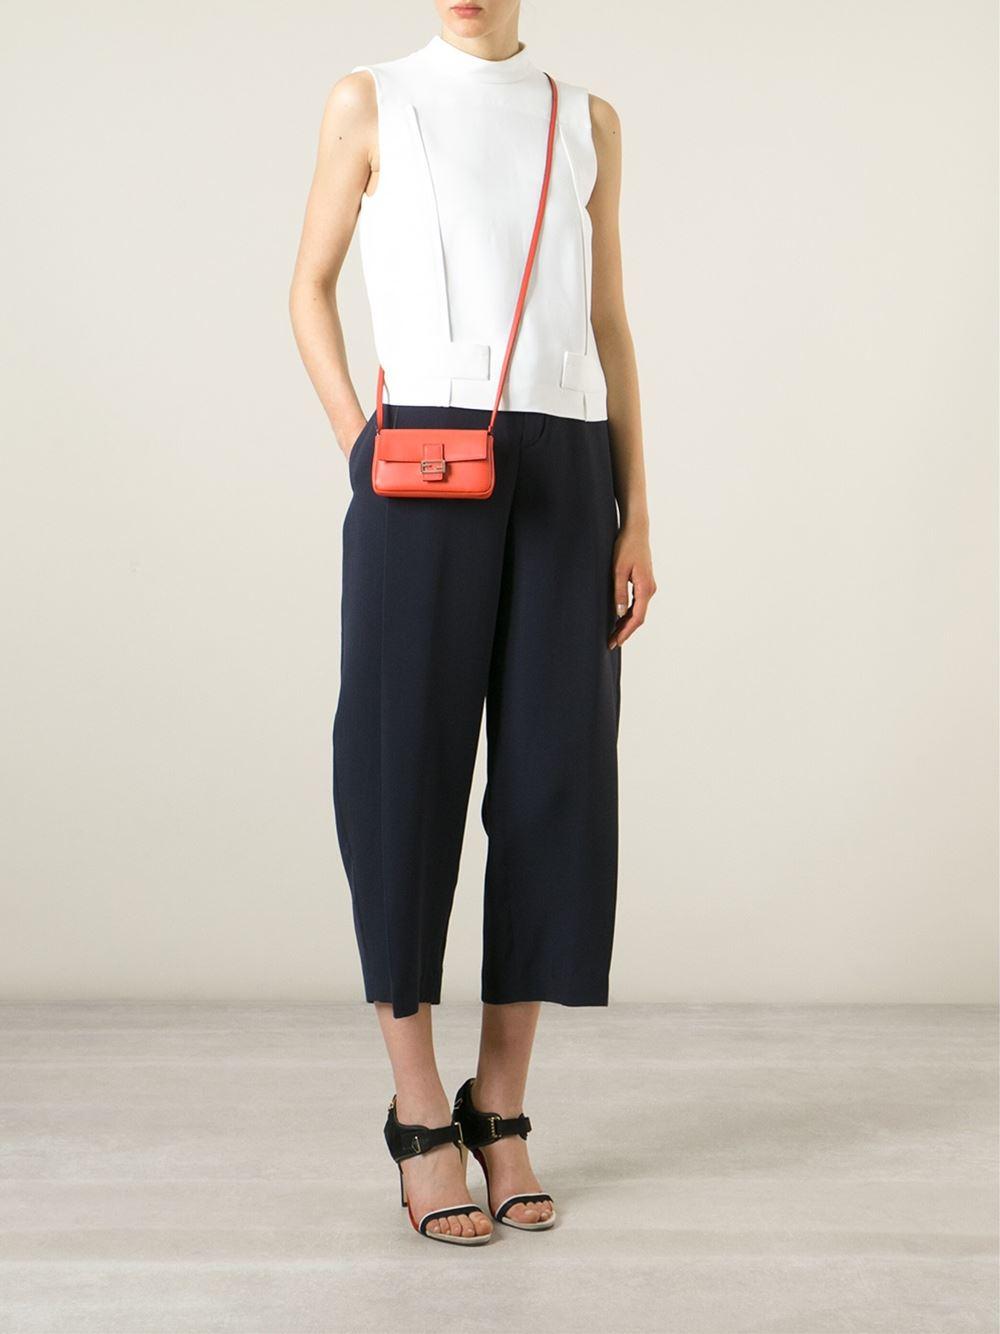 6c798d0d3d Lyst - Fendi Micro  Baguette  Crossbody Bag in Orange